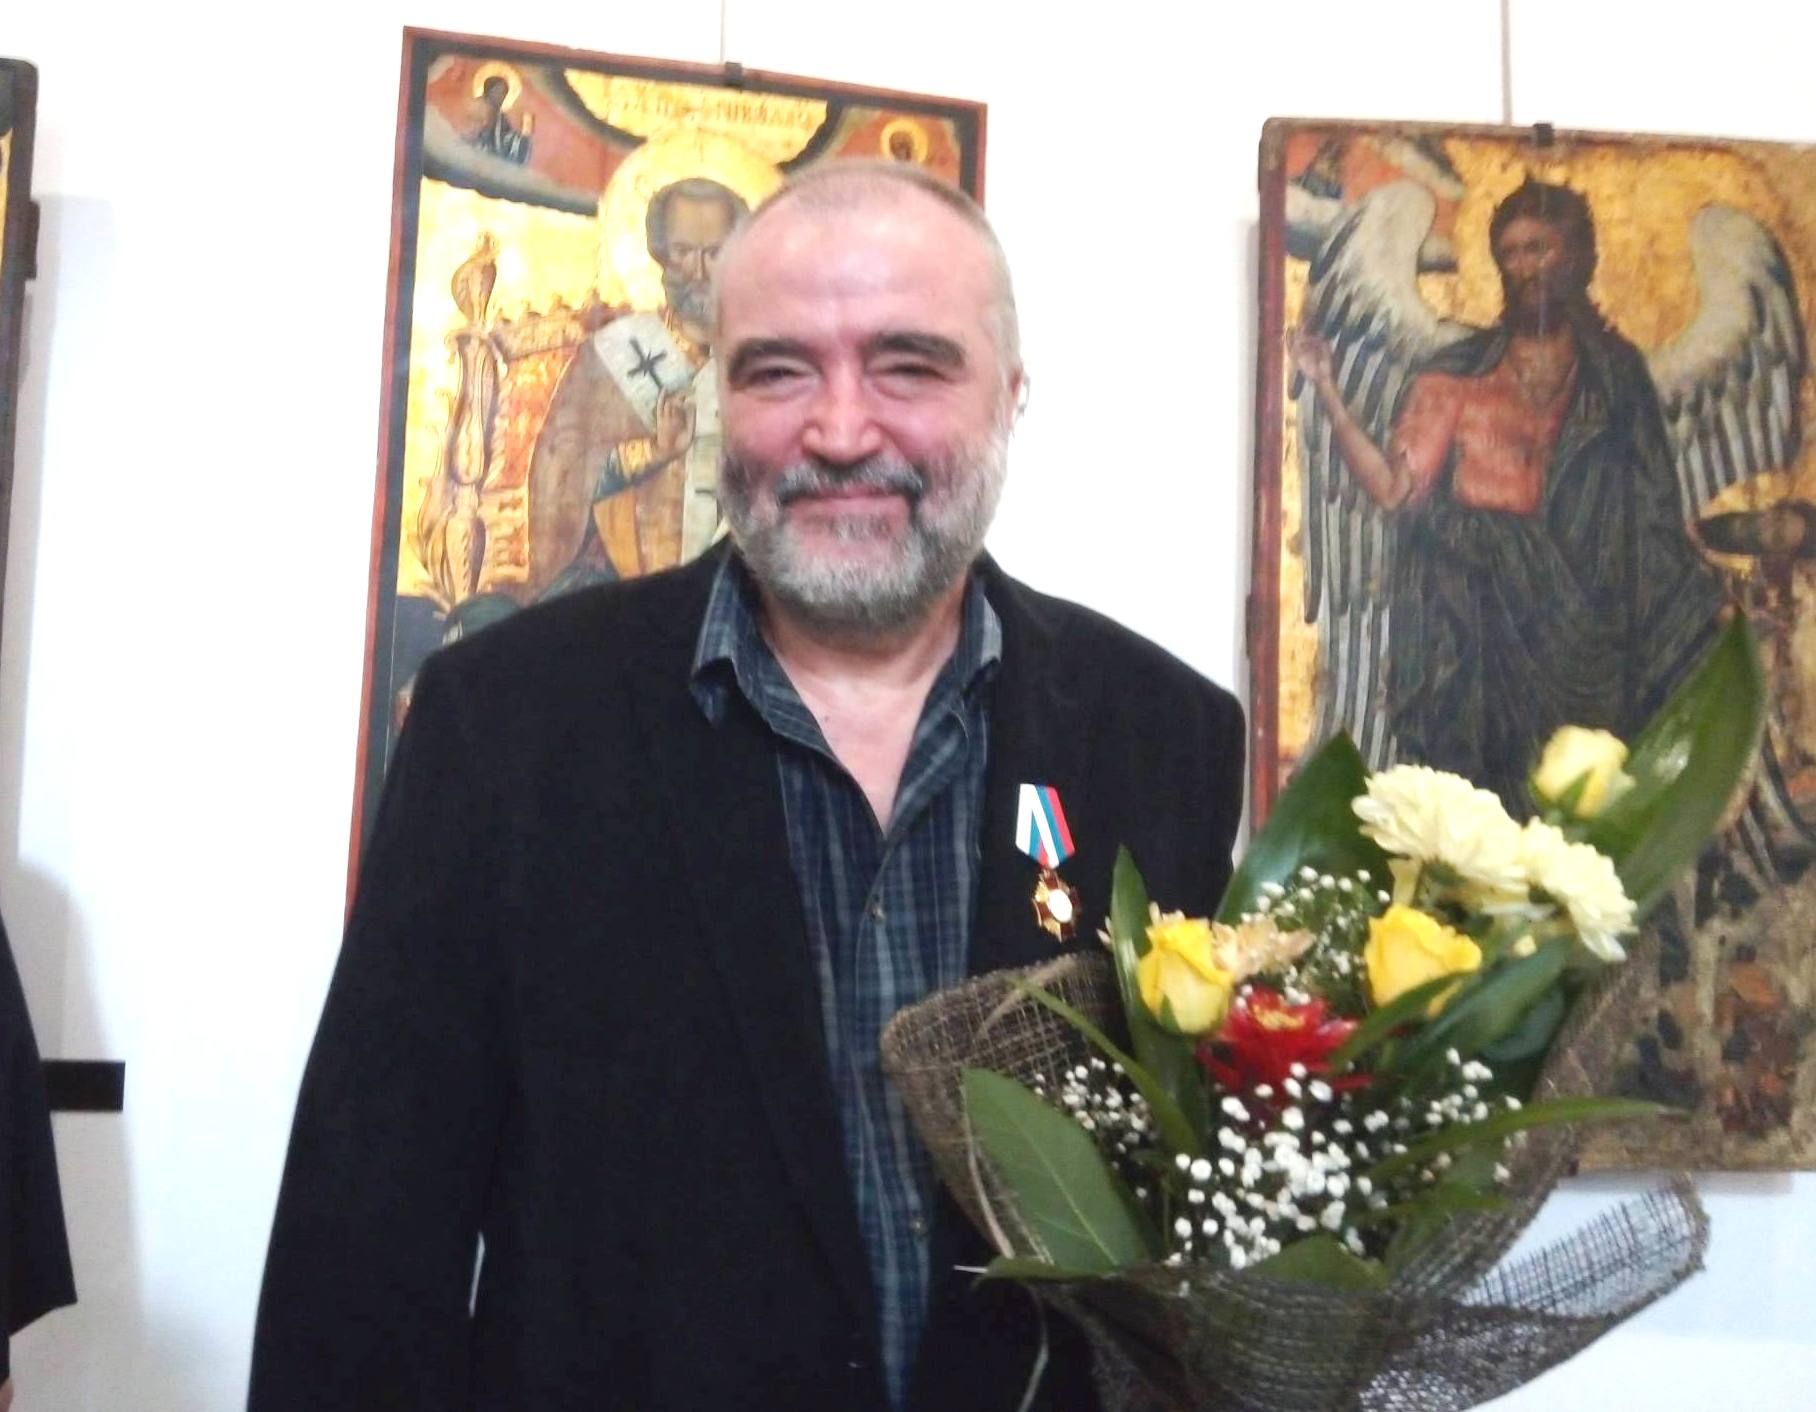 Световно признание за художника-реставратор Климент Атанасов